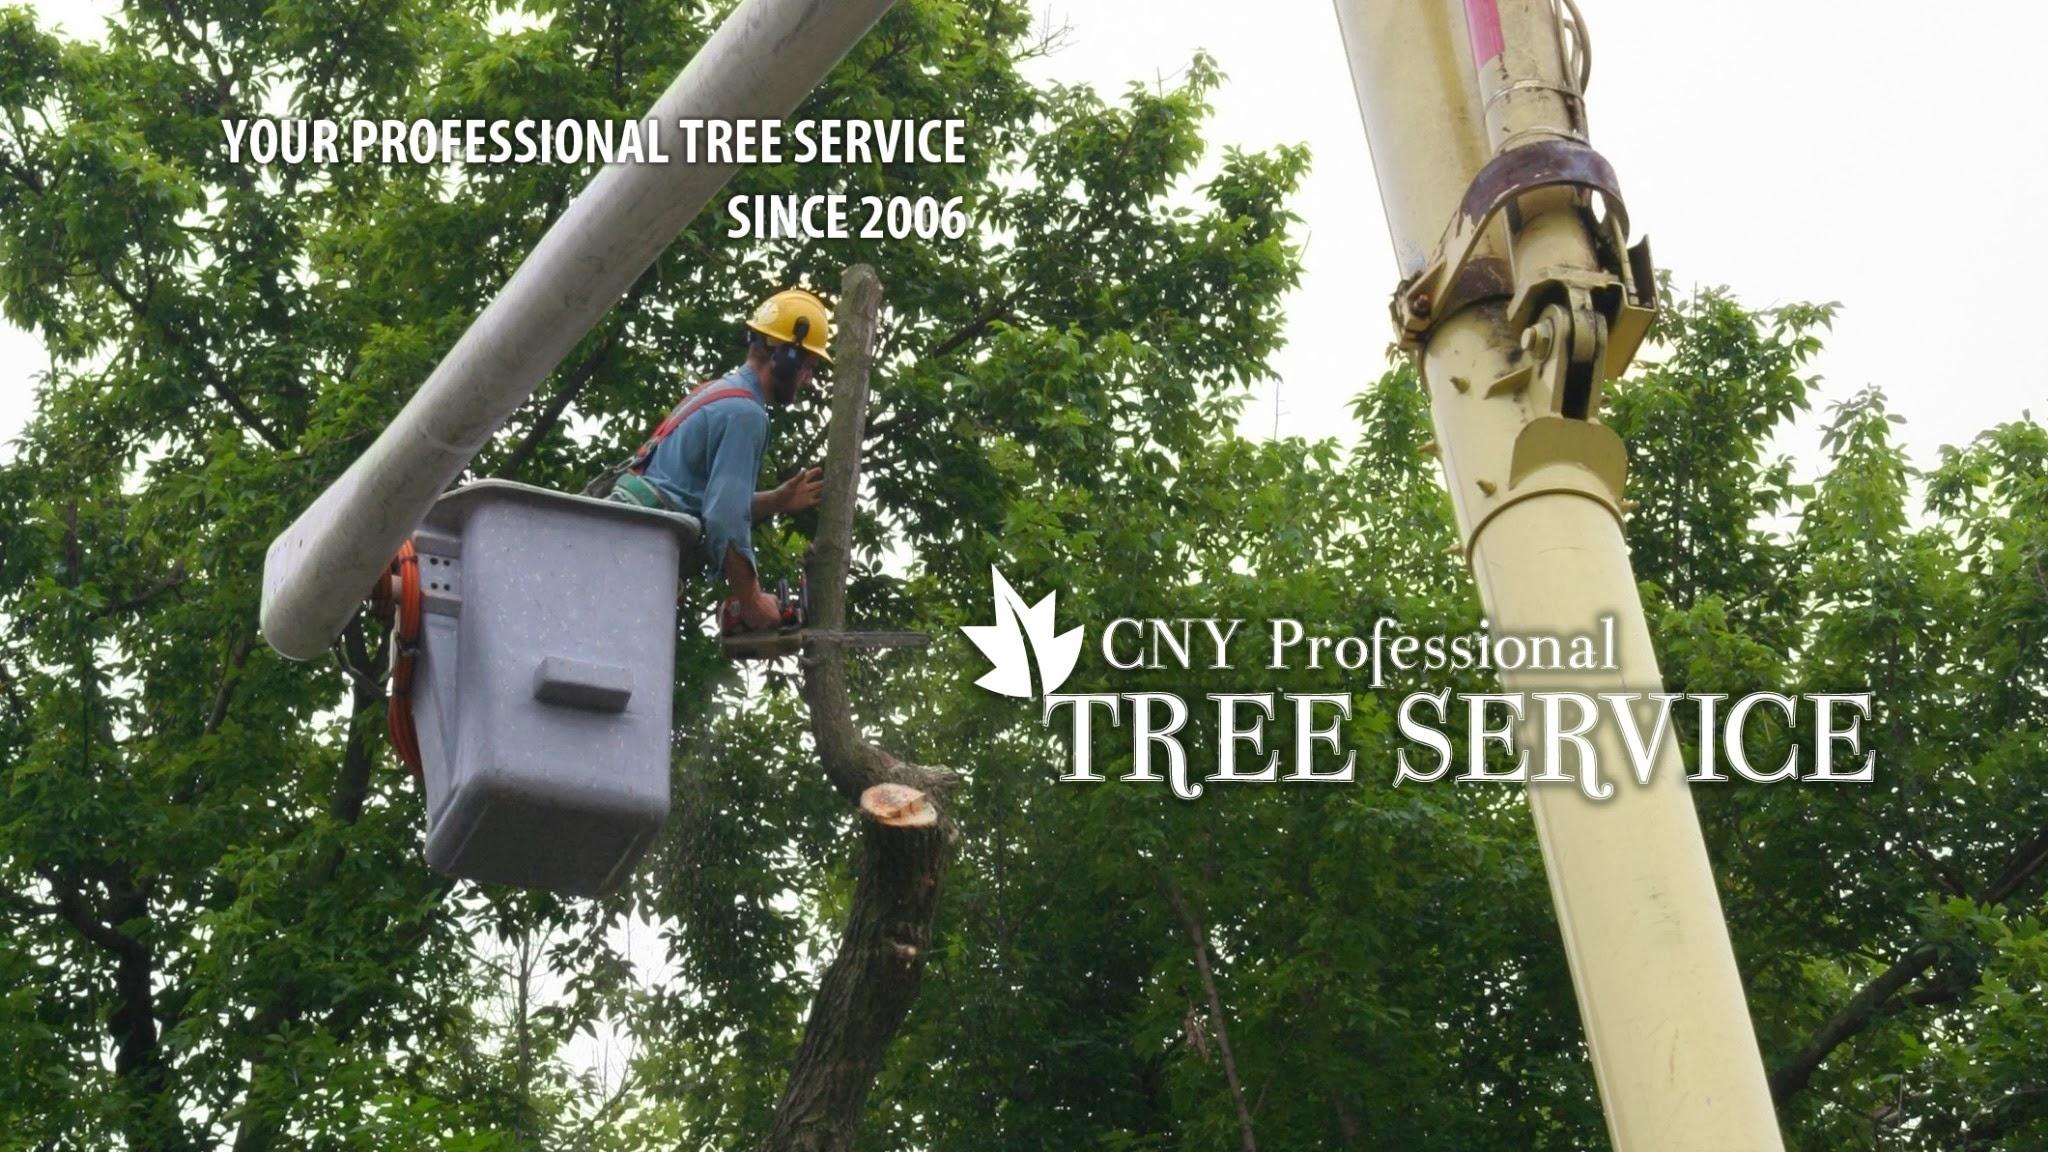 CNY Professional Tree Service